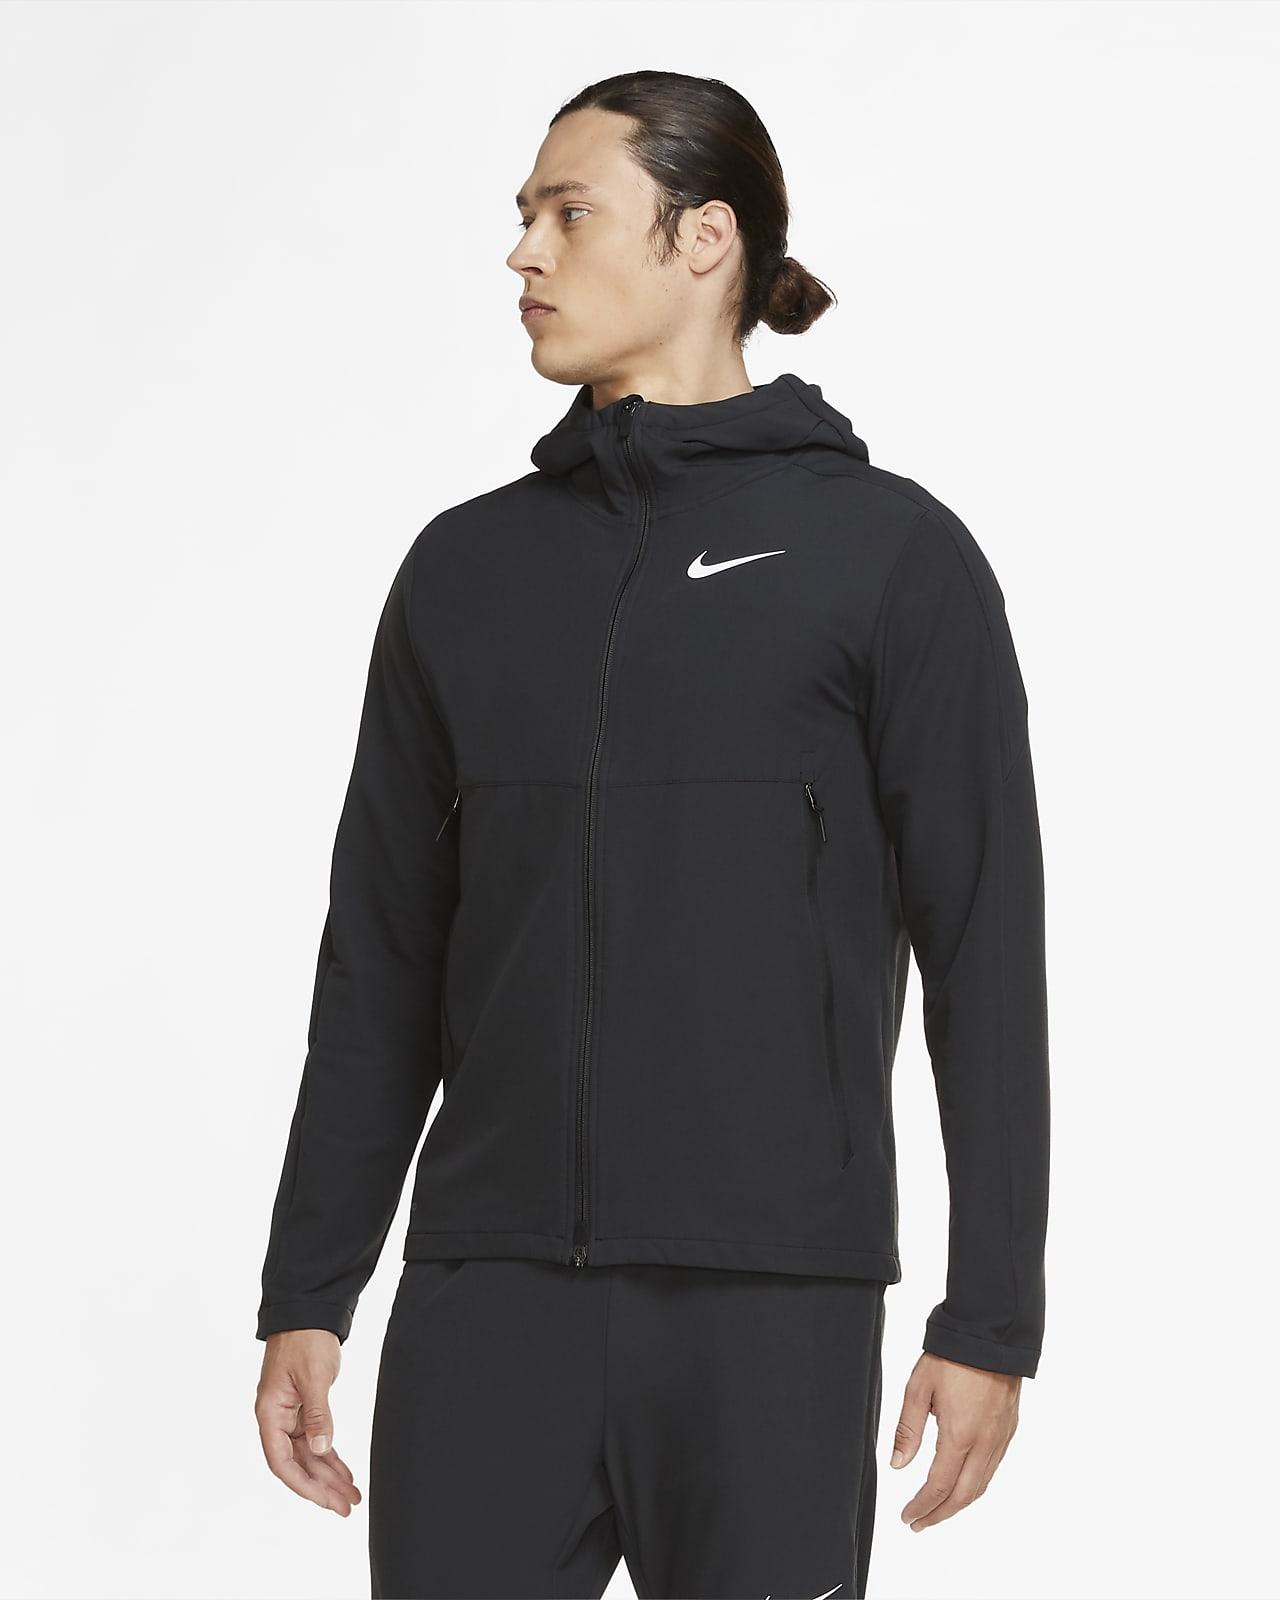 Nike Winter-Trainingsjacke aus Webmaterial für Herren